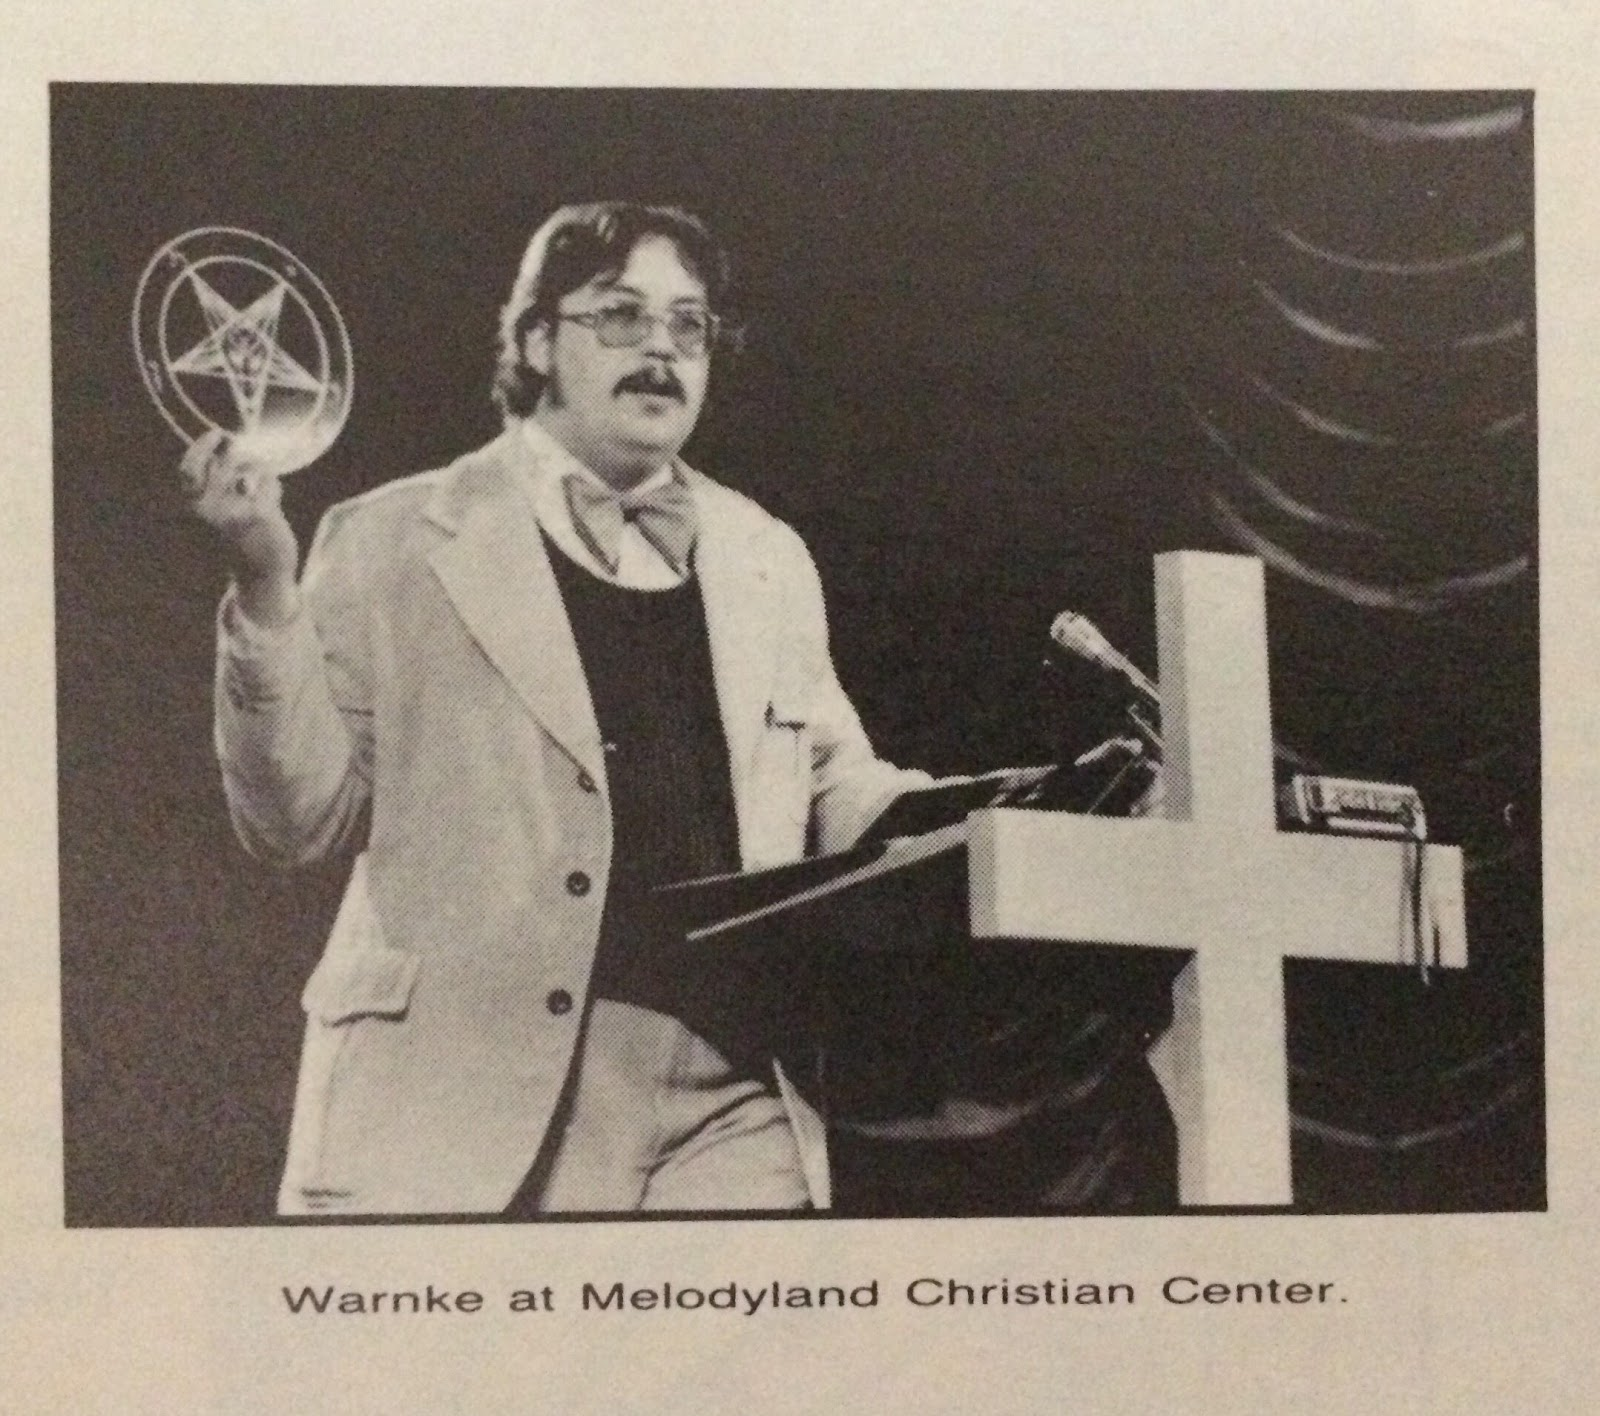 Melodyland Christian Center